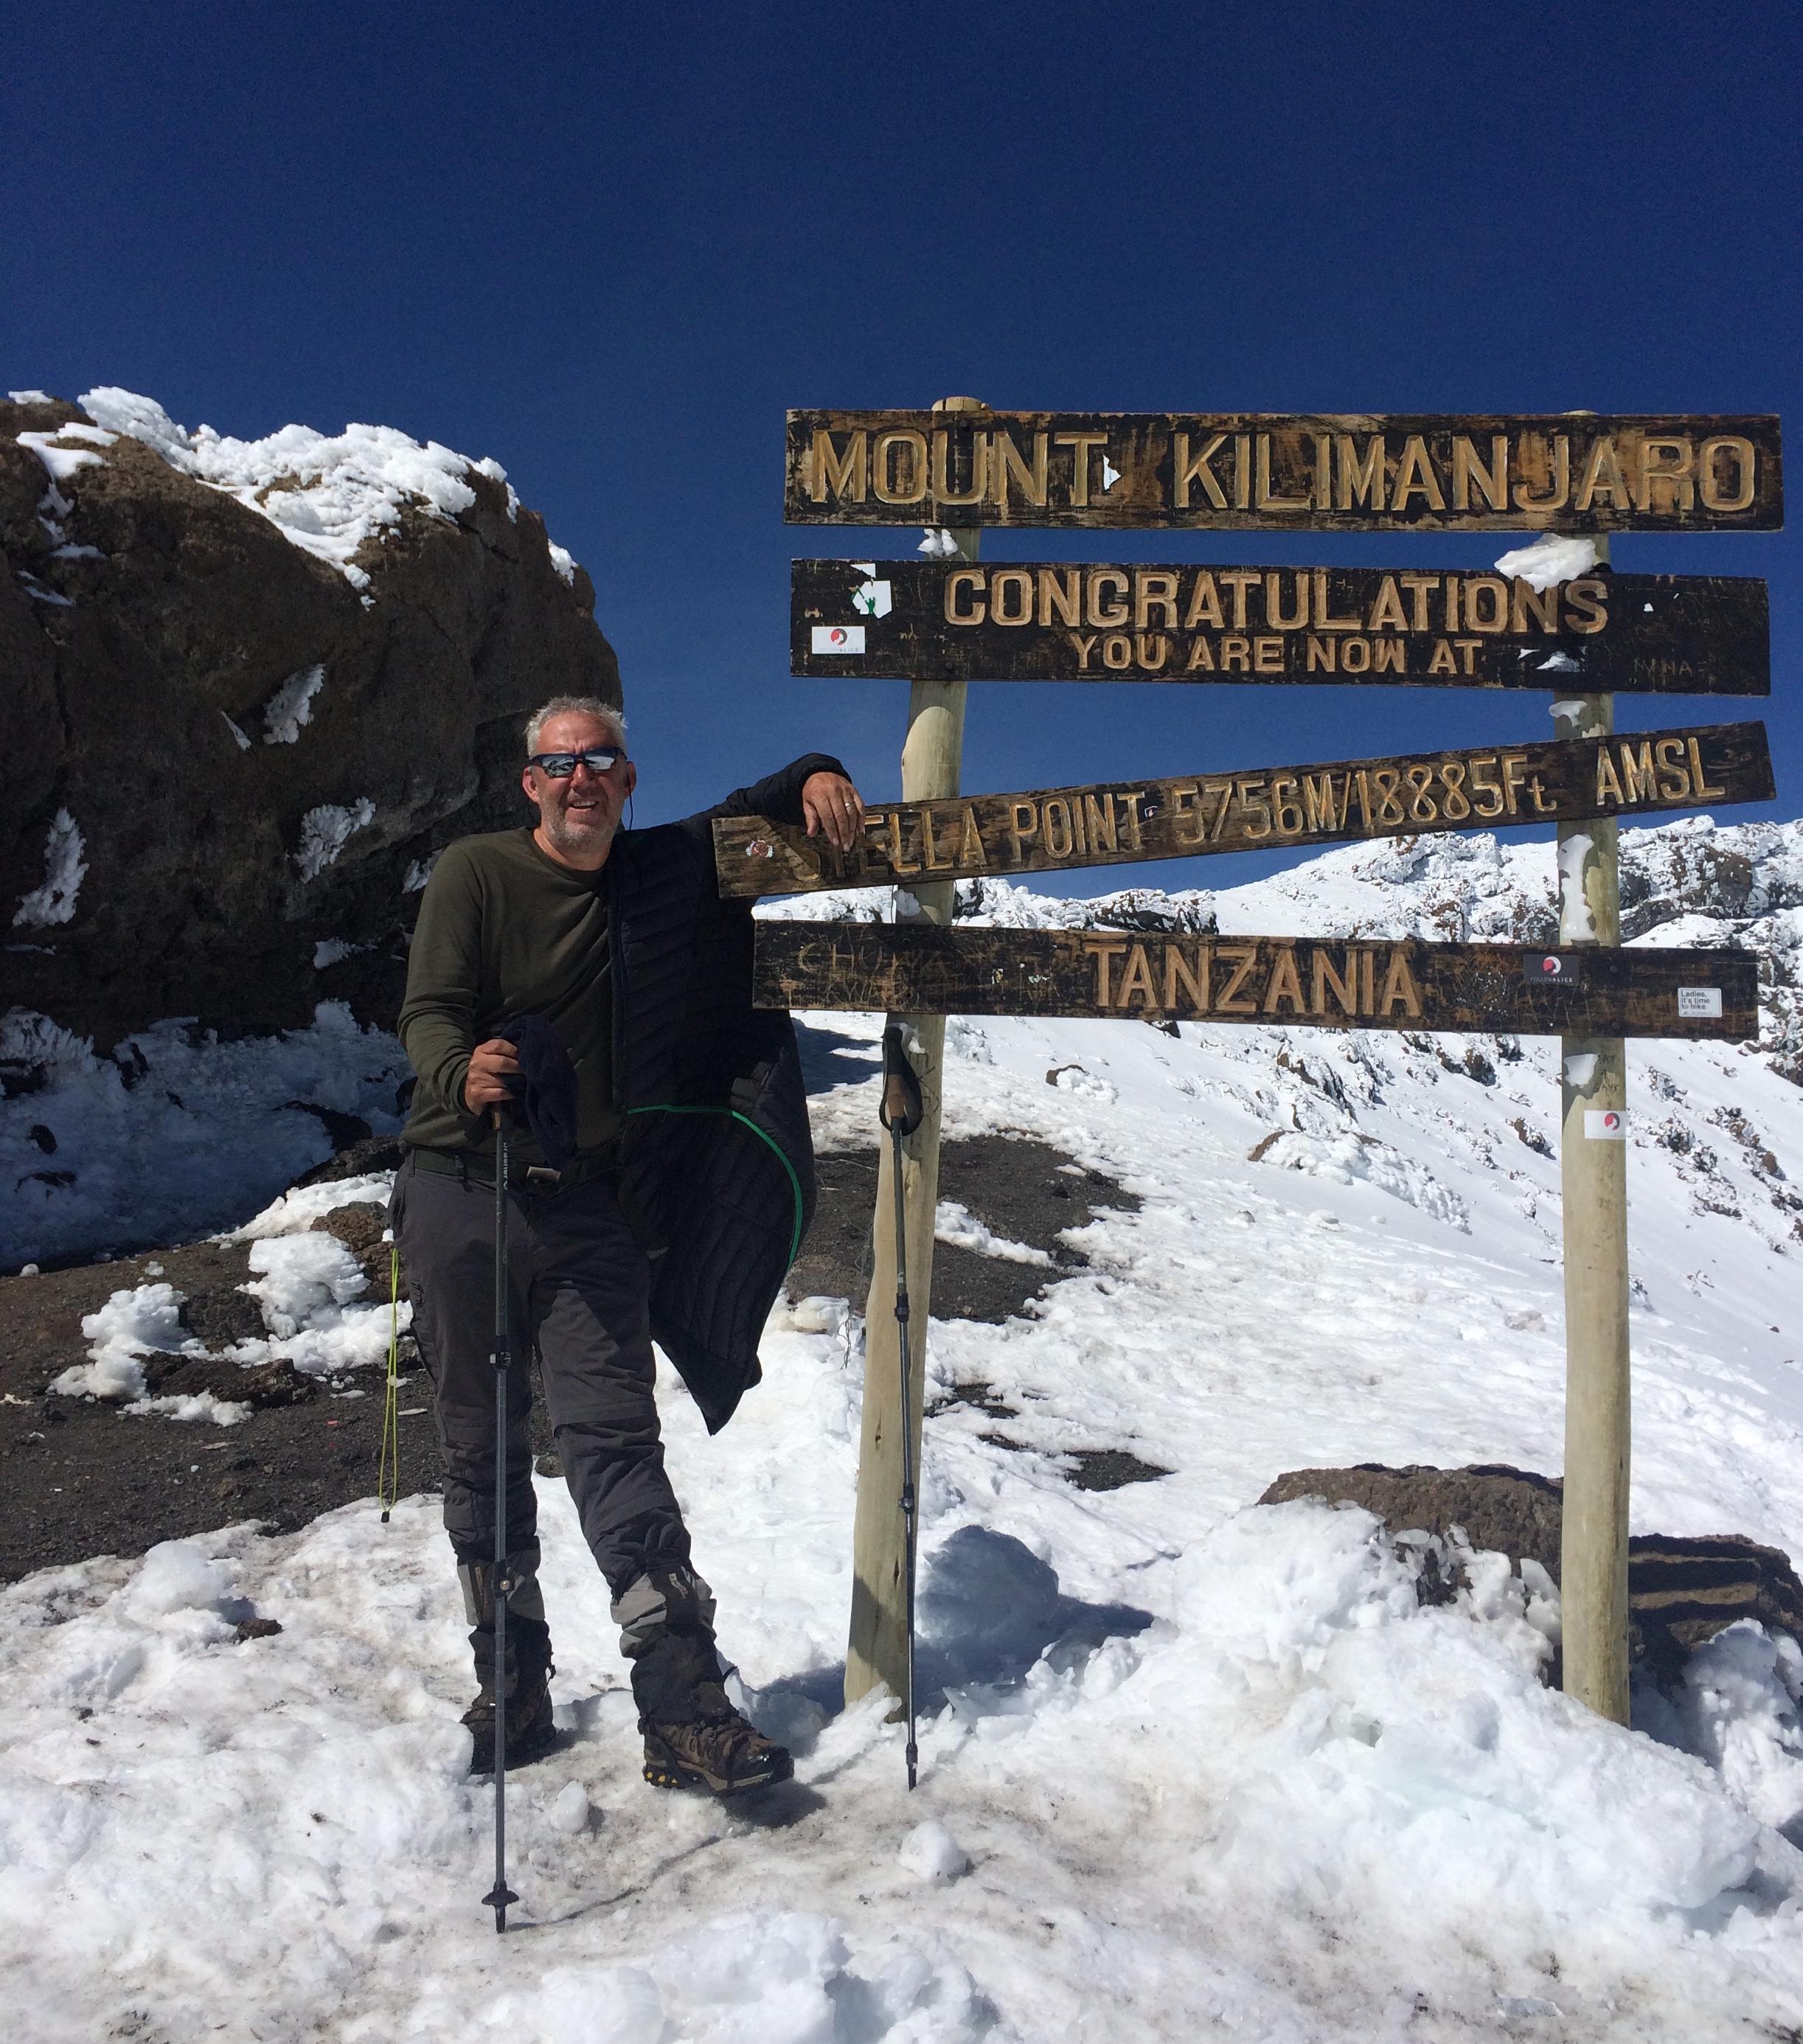 Mark Elward at the summit of Mount Kilimanjaro